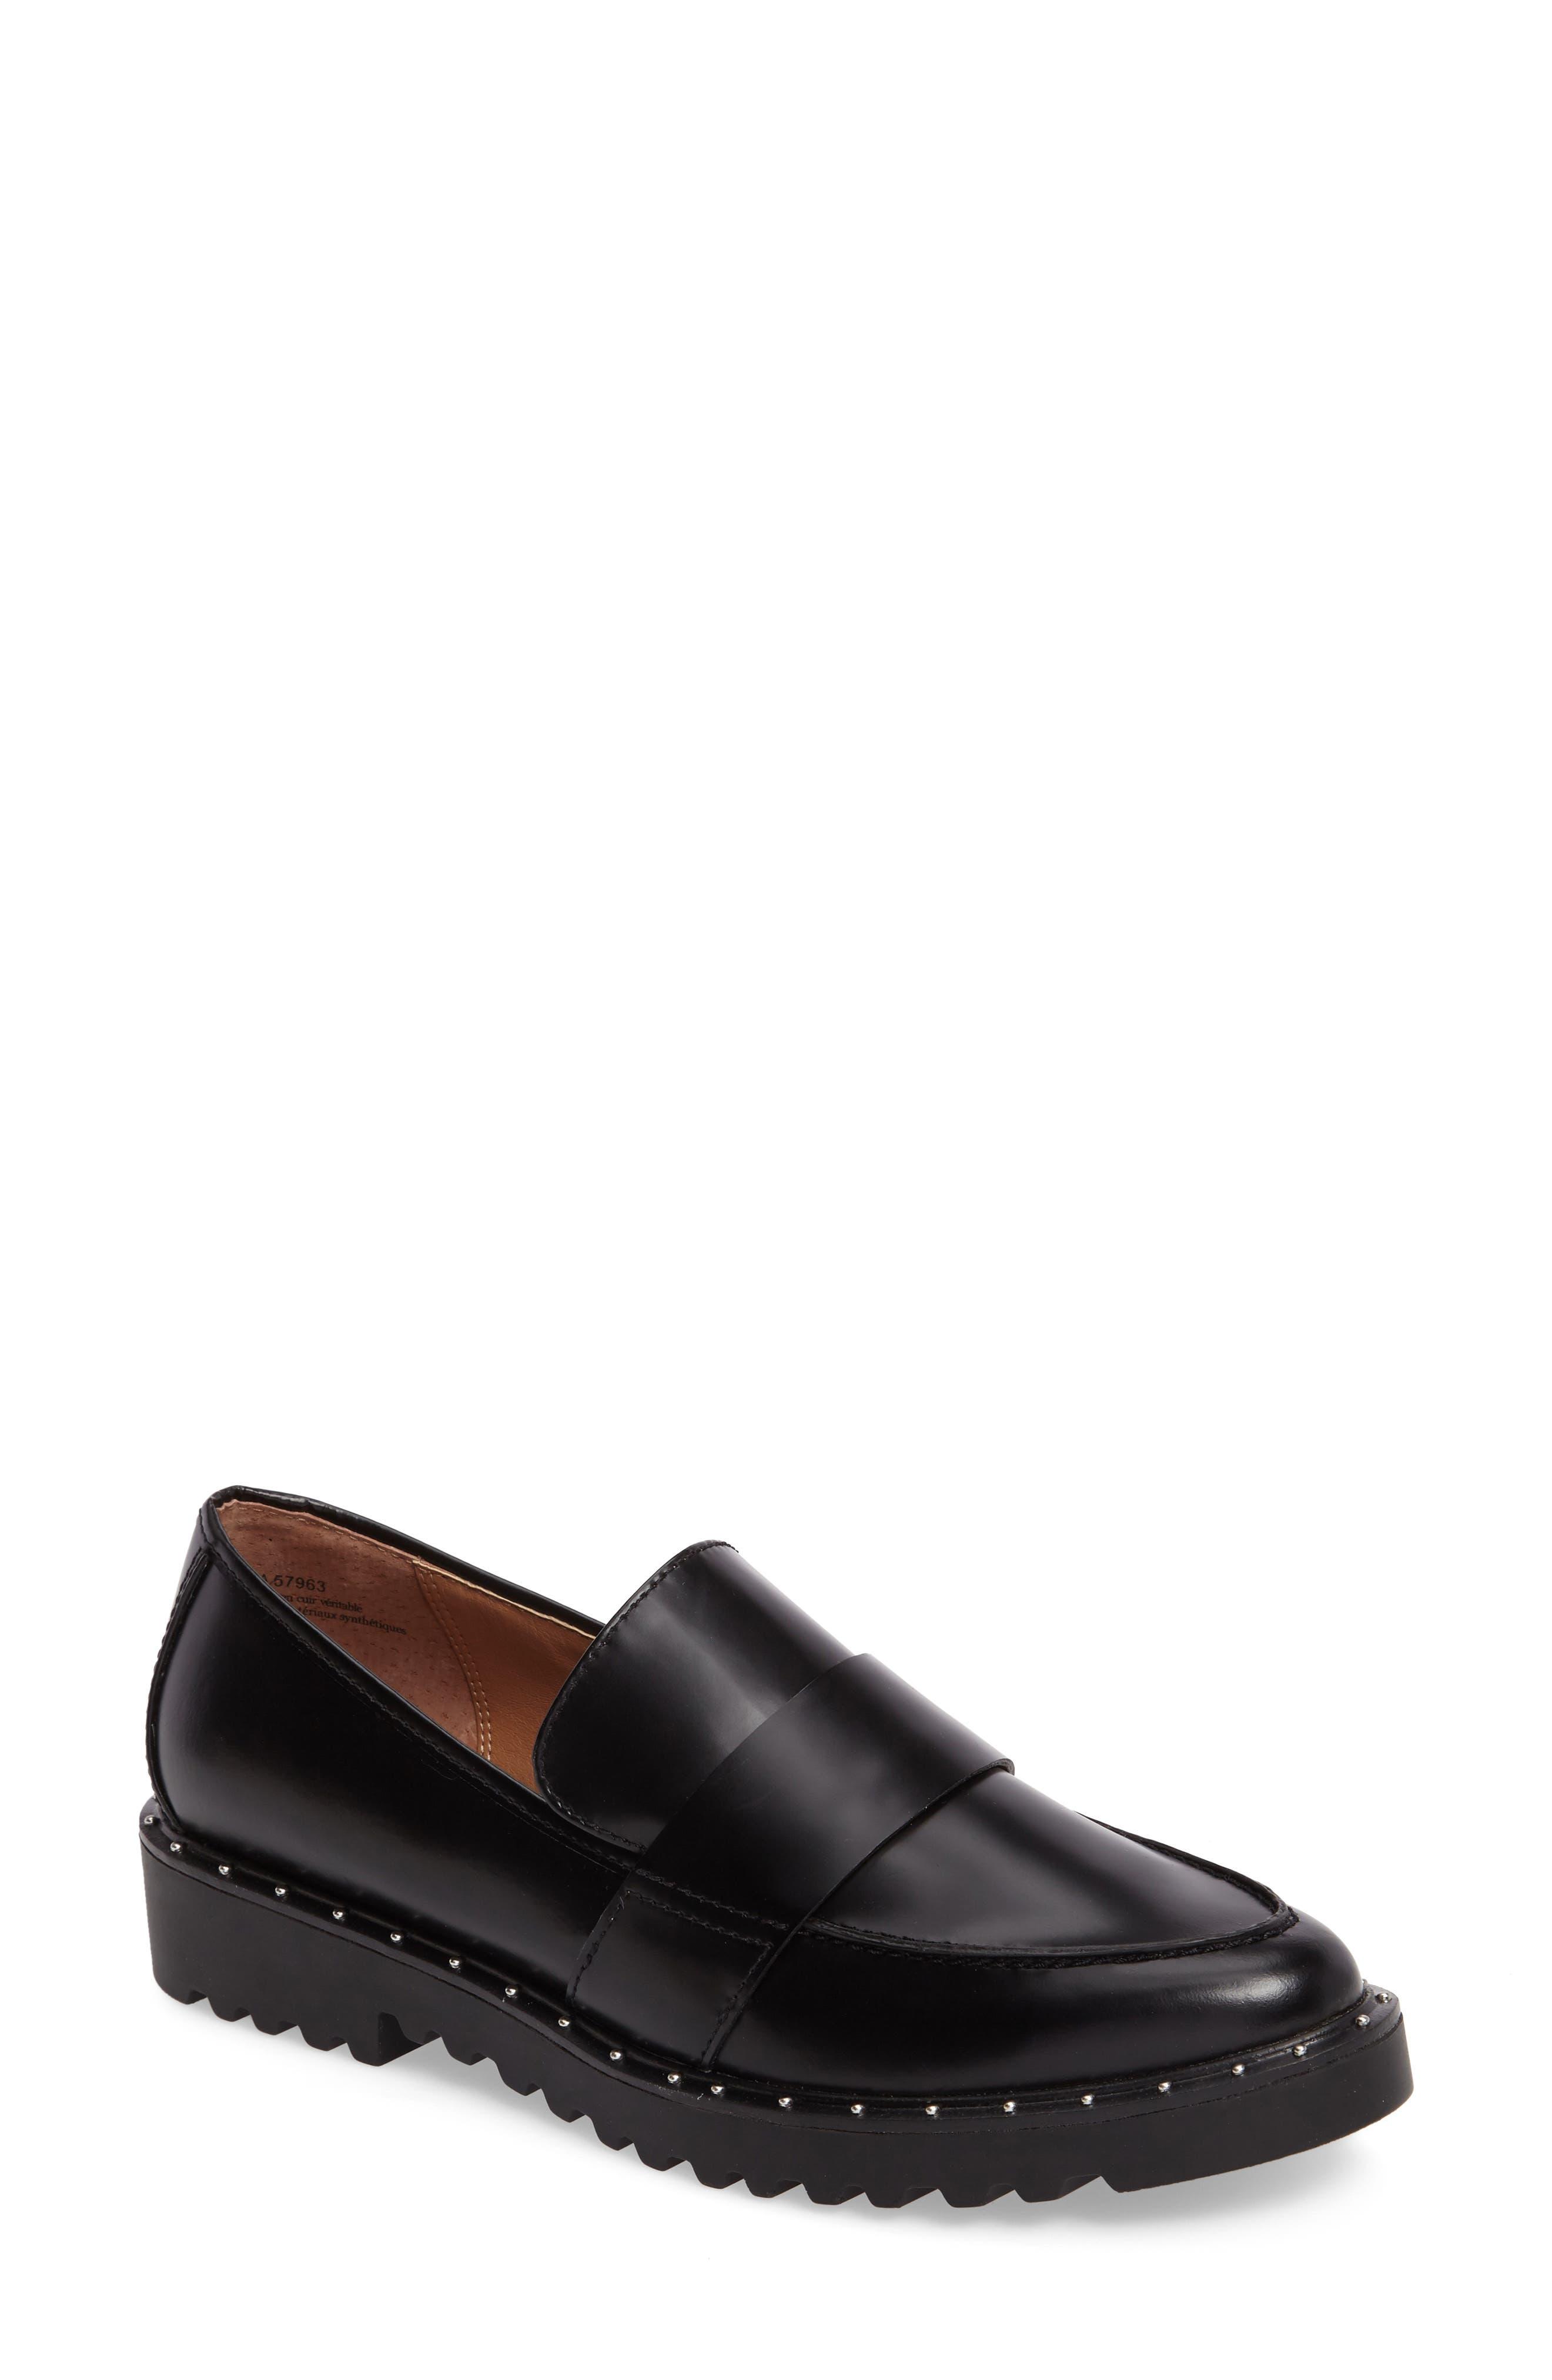 Emily Studded Flat,                         Main,                         color, Black Box Leather